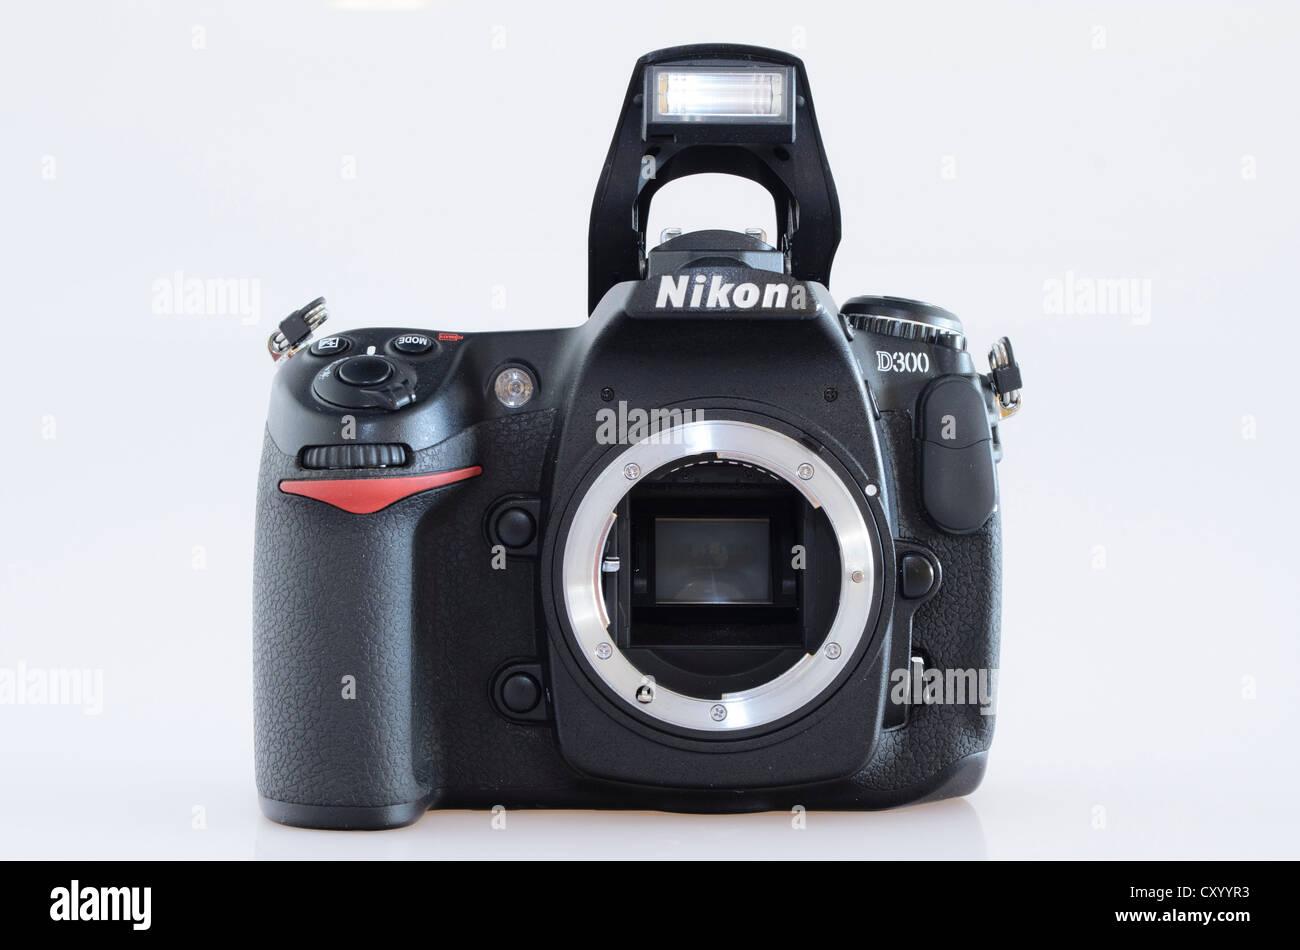 Nikon Shot Imágenes De Stock & Nikon Shot Fotos De Stock - Alamy